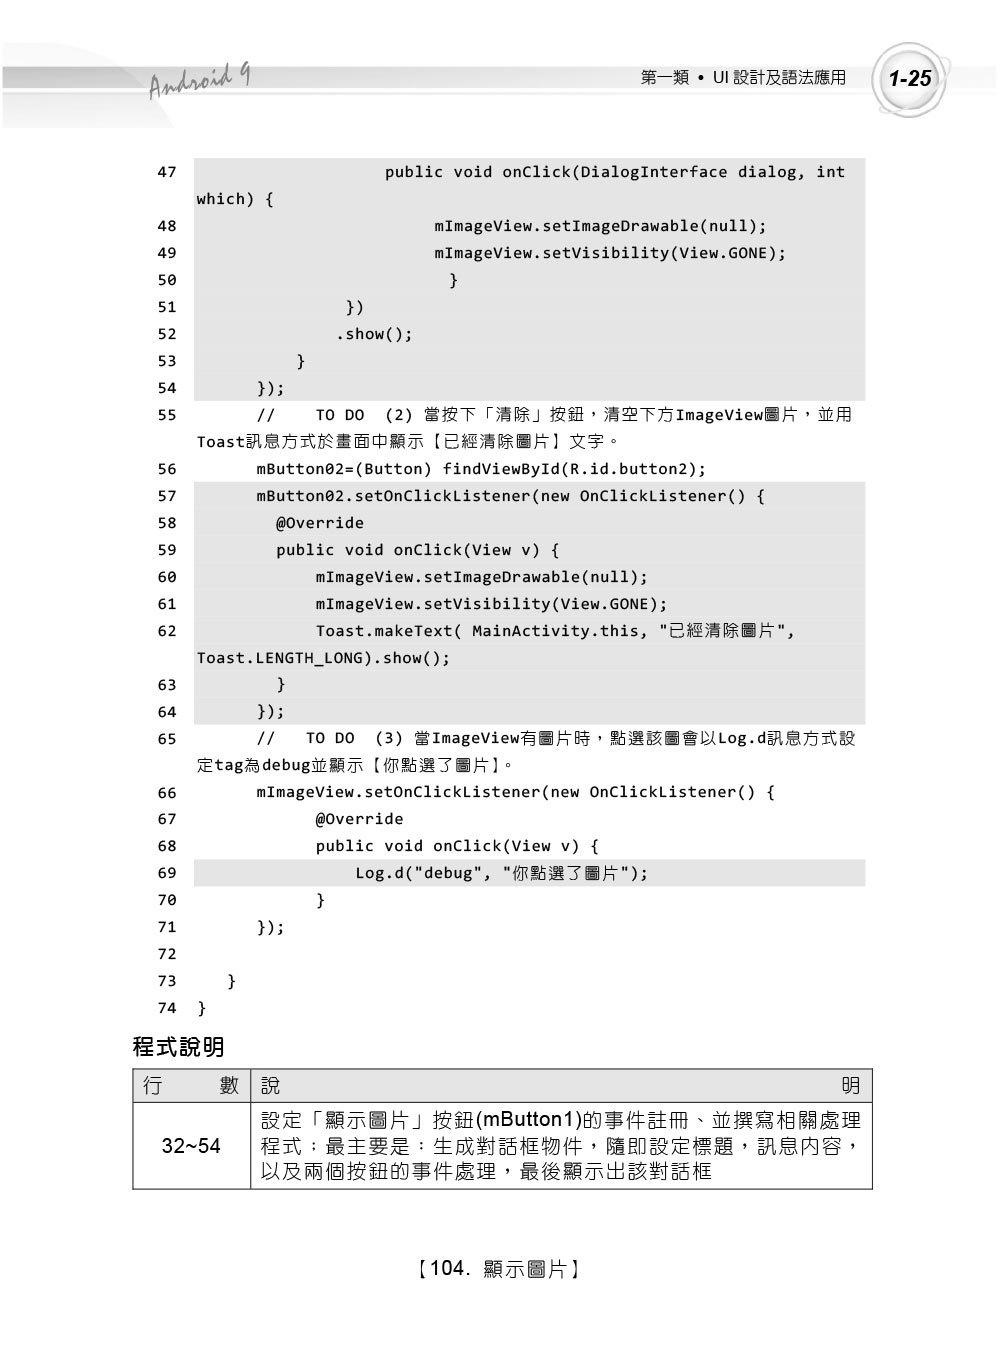 TQC+ 行動裝置應用程式設計認證指南解題秘笈 -- Android 9-preview-5